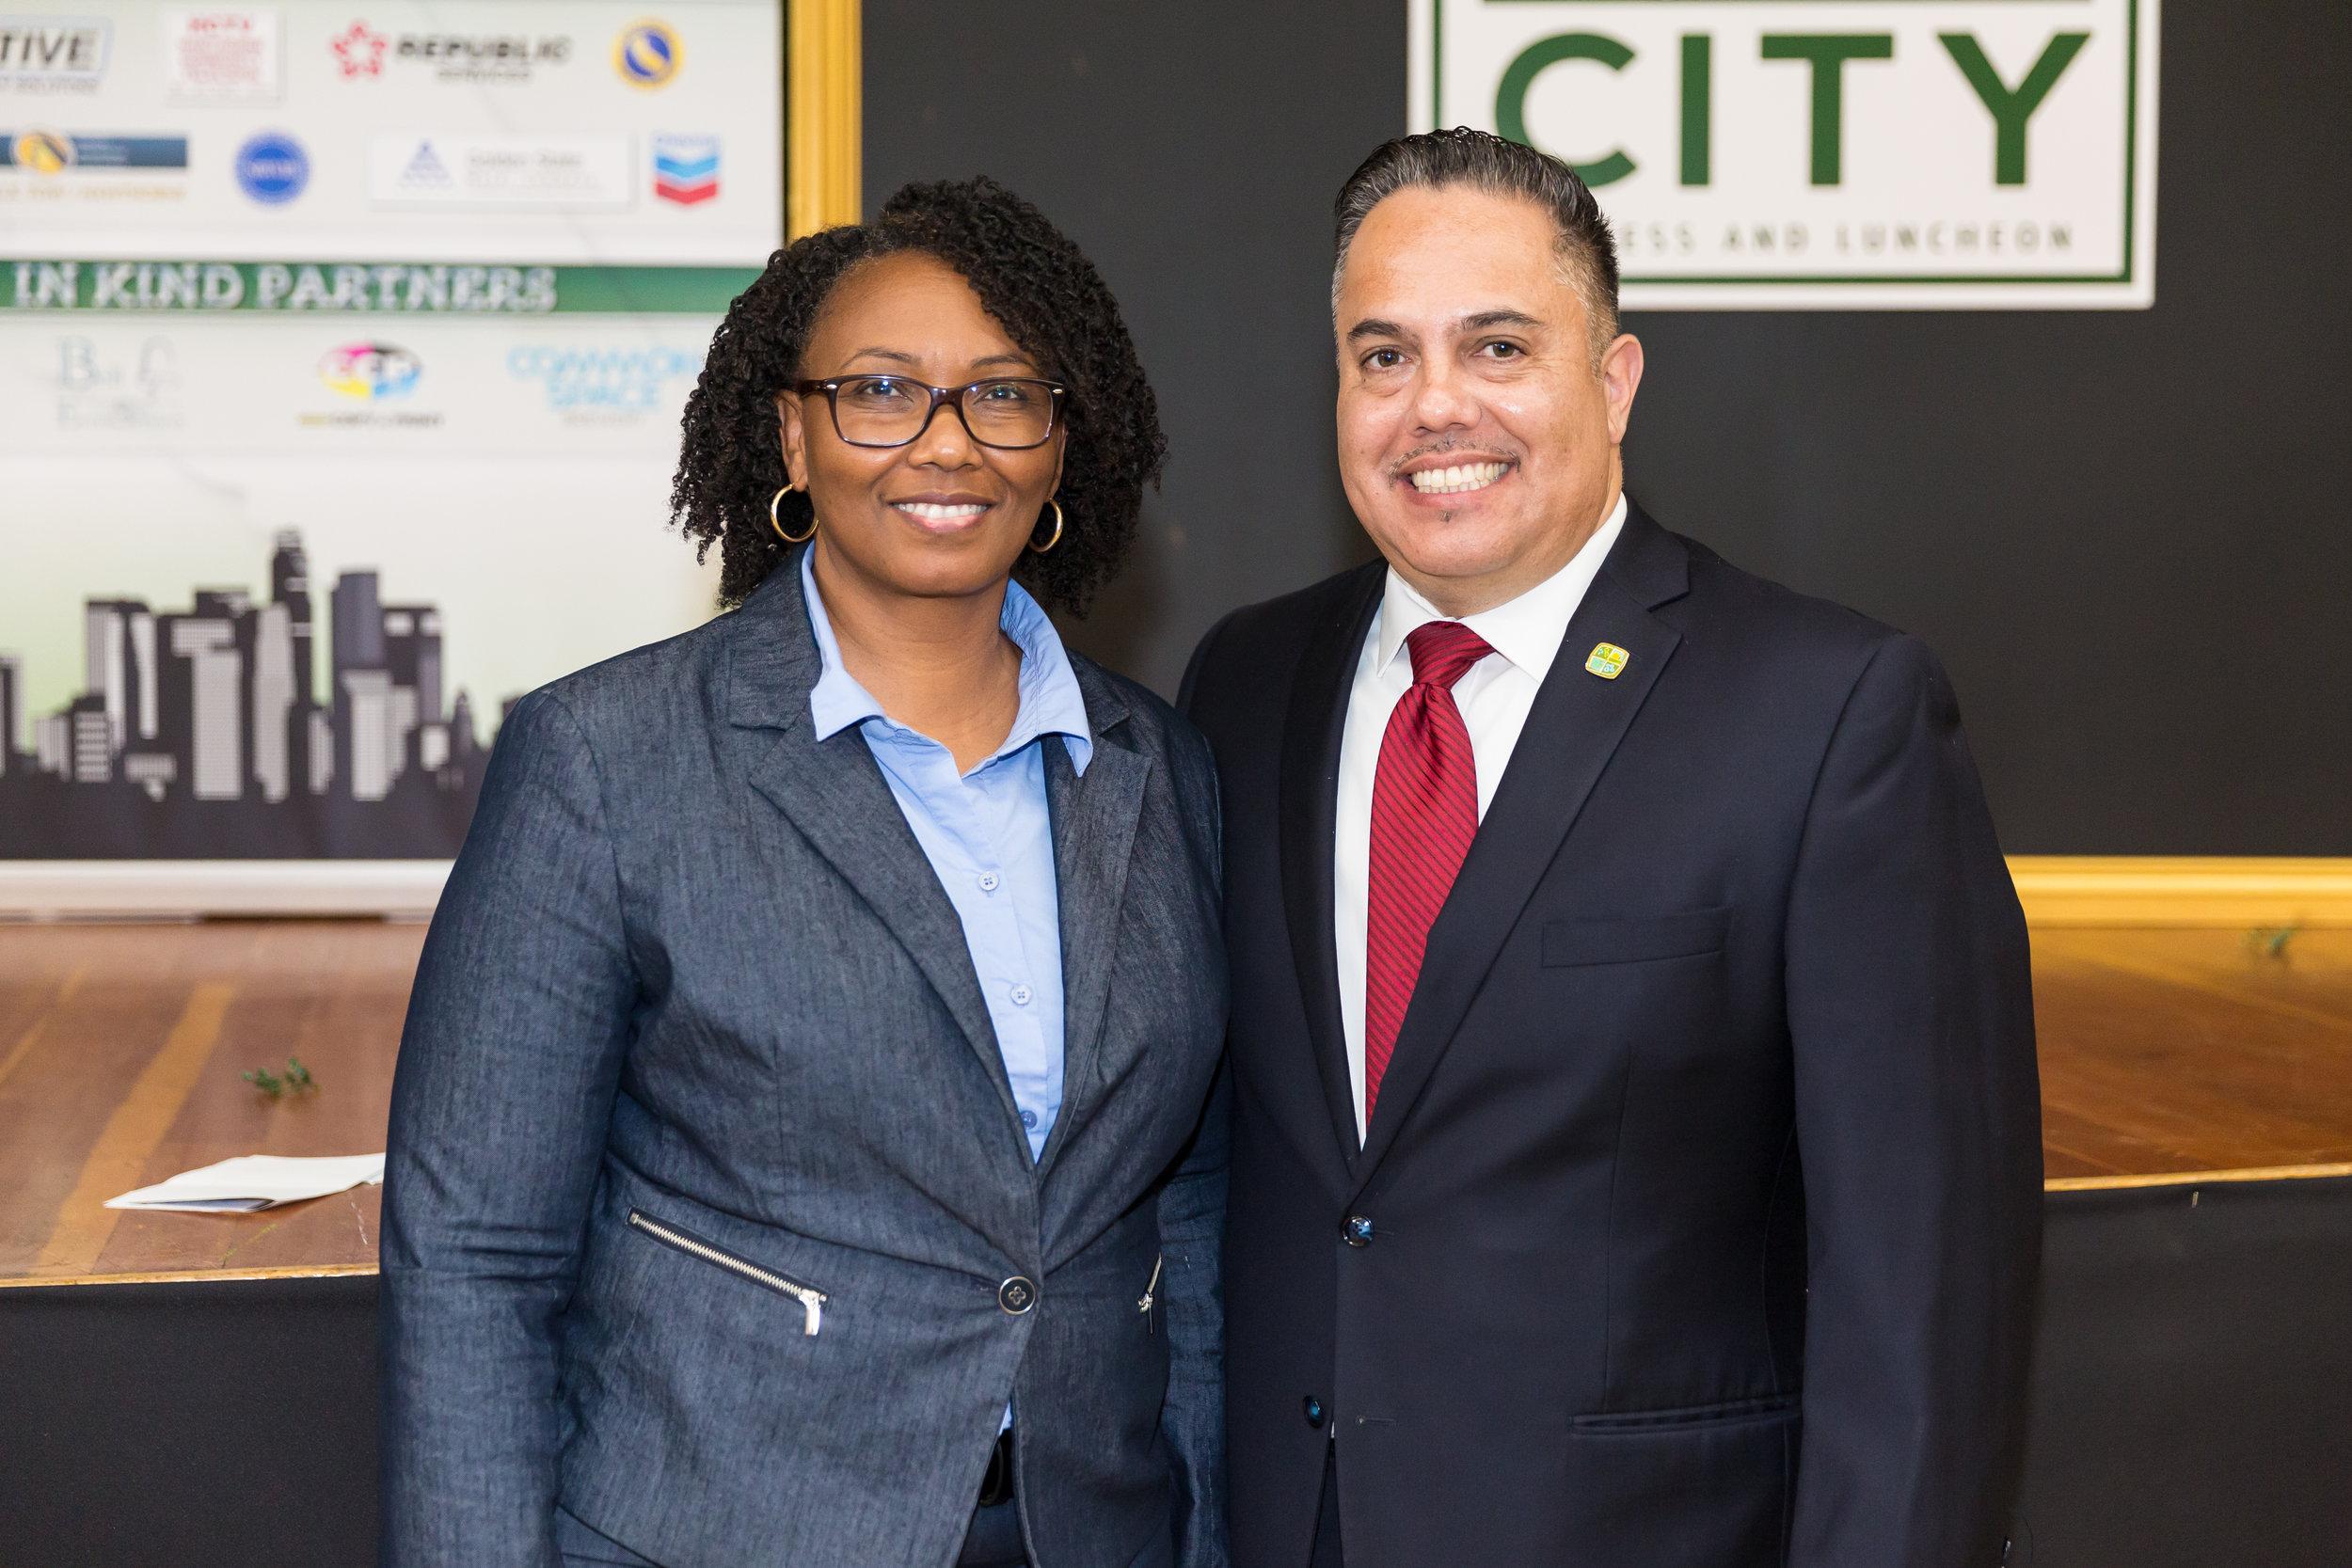 Mayor Vargas with Brenda Willisams